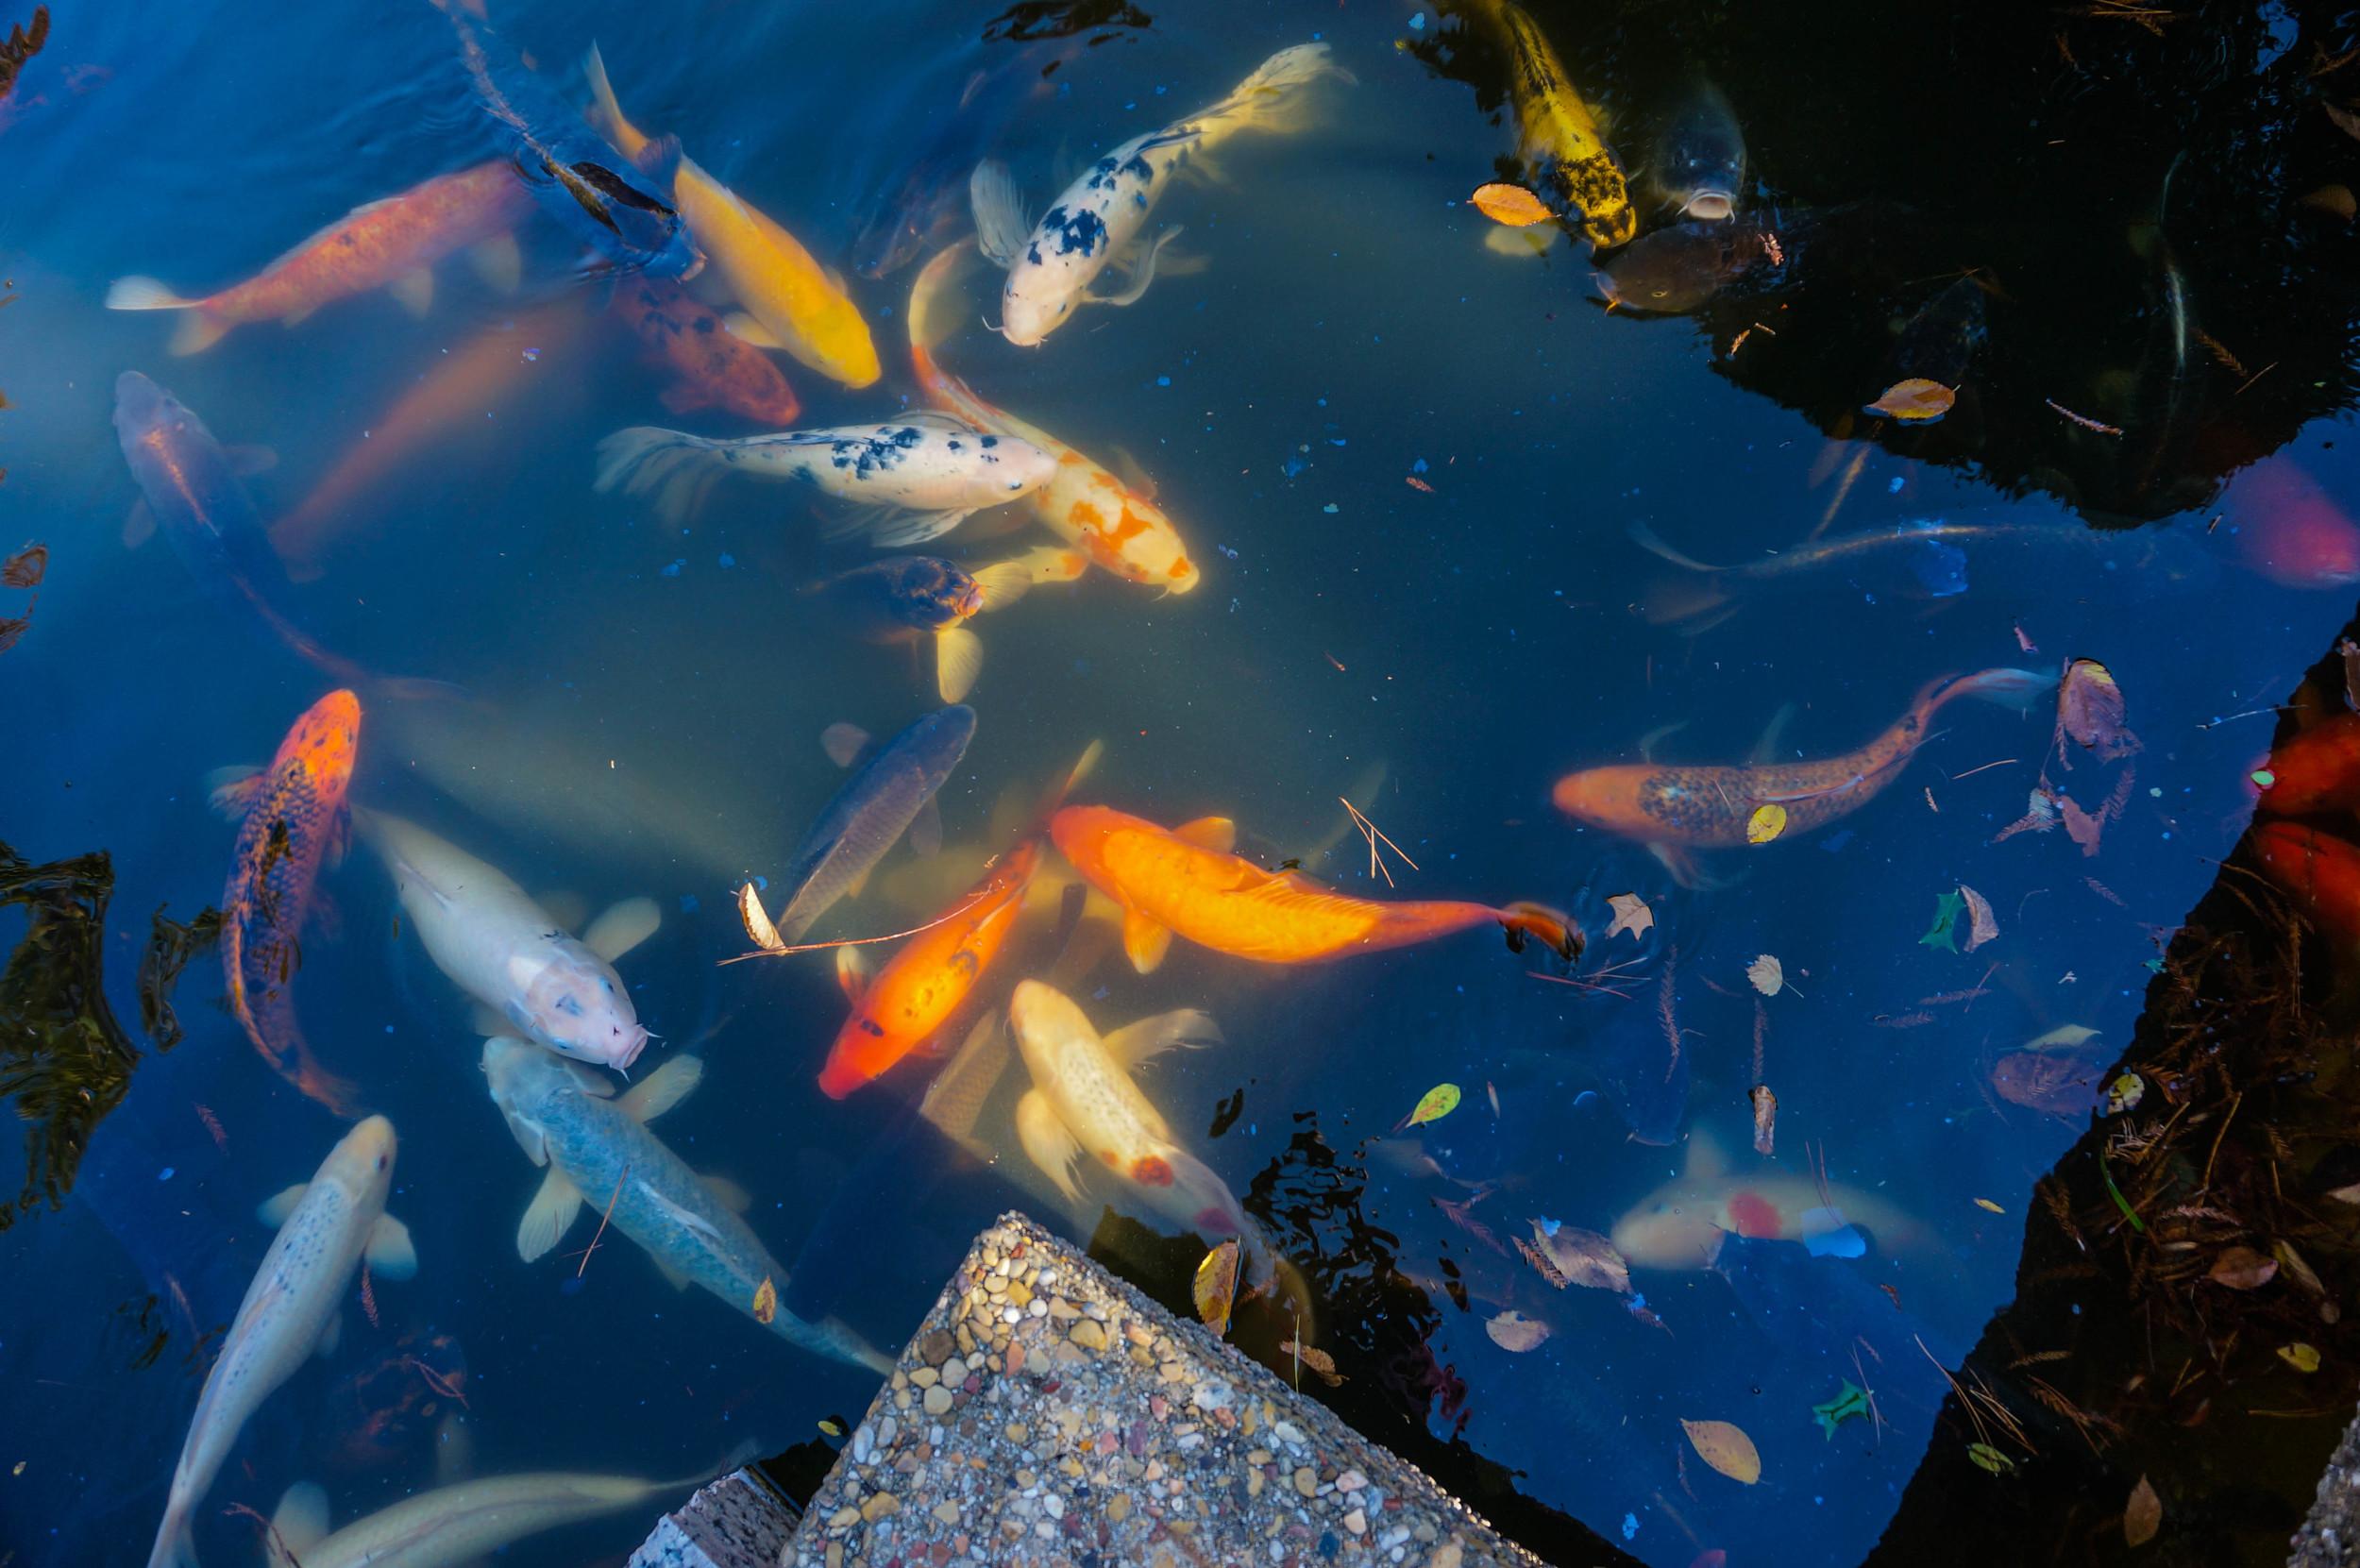 Koi Fish waiting for food